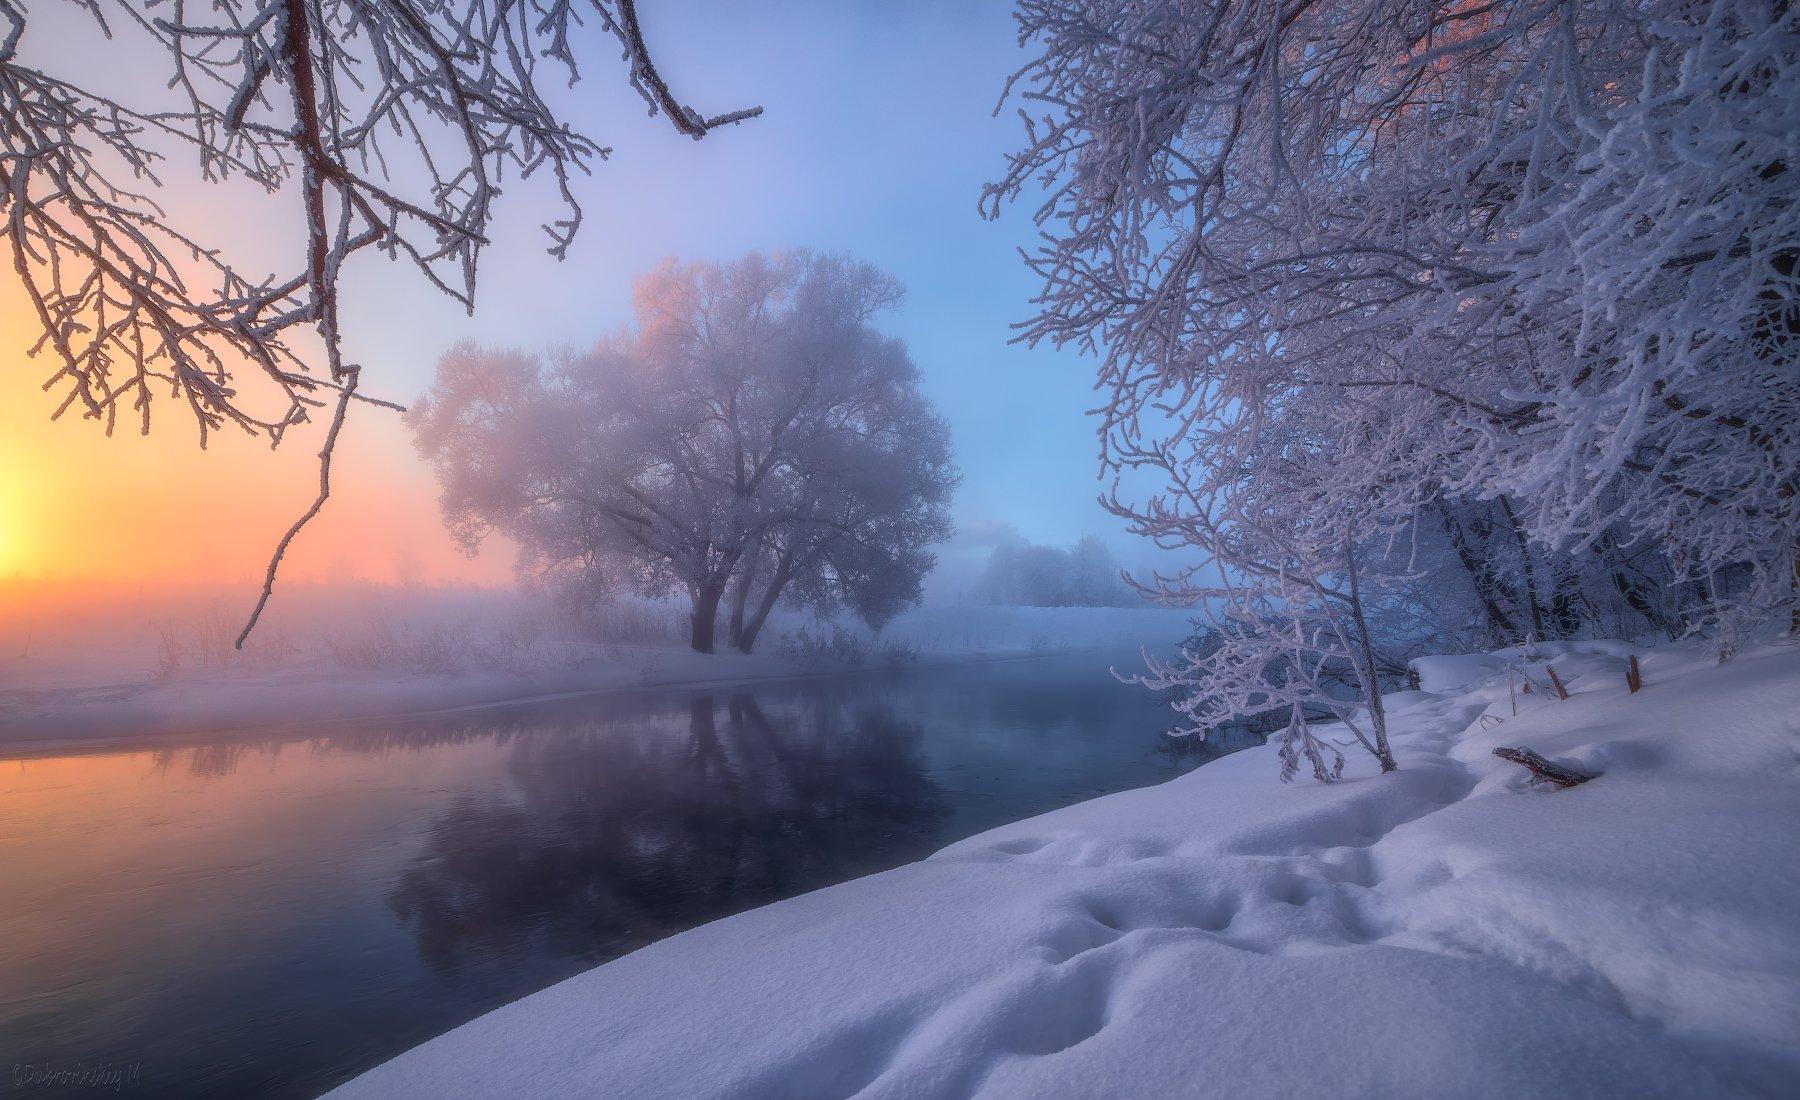 истра, рассвет, туман, мороз, зима, дерево, река, Михаил Дубровинский